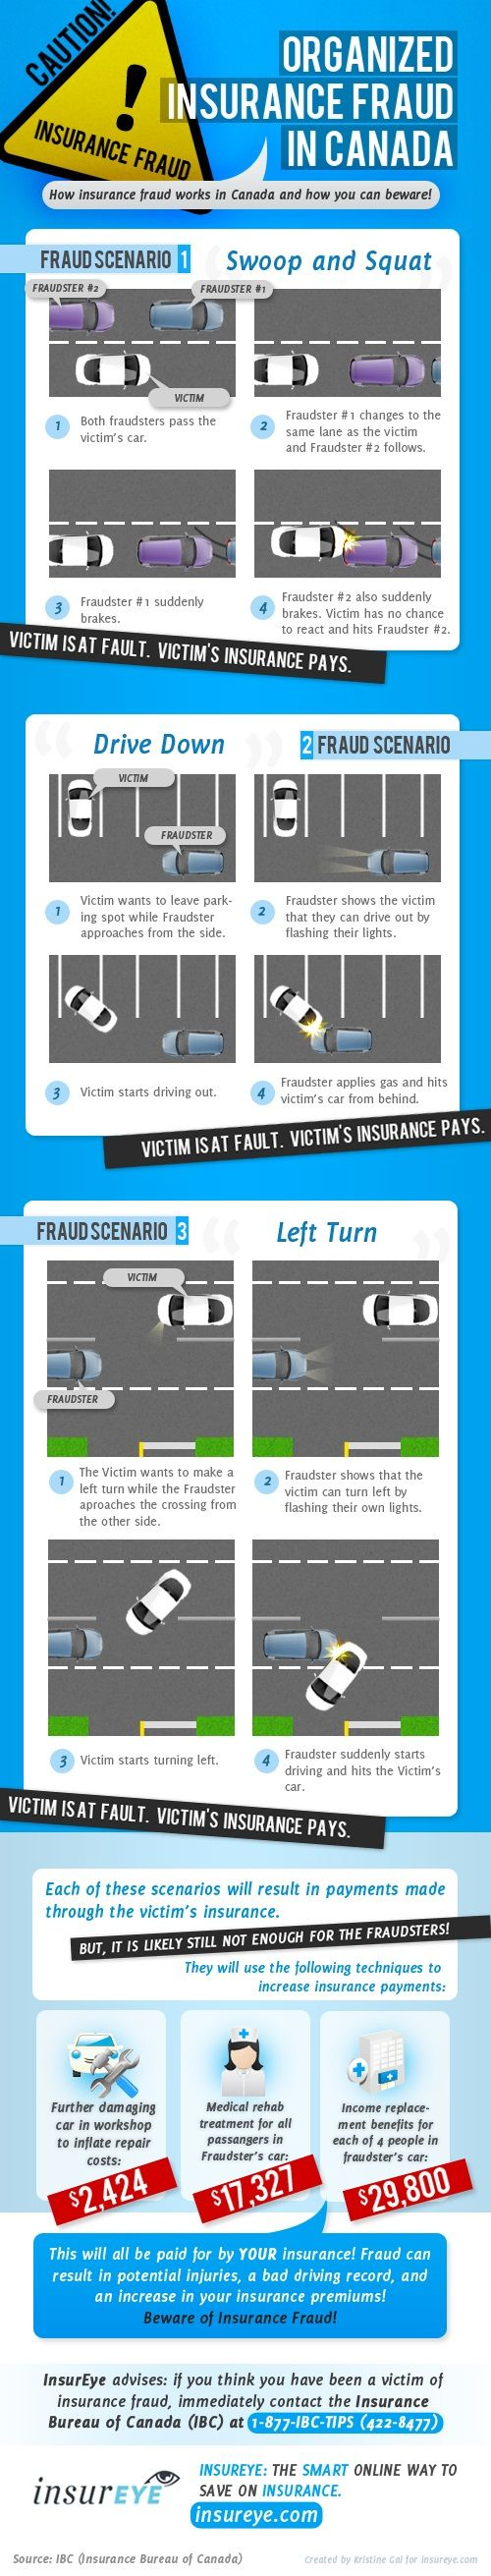 Organized insurance fraud in Canada Car insurance